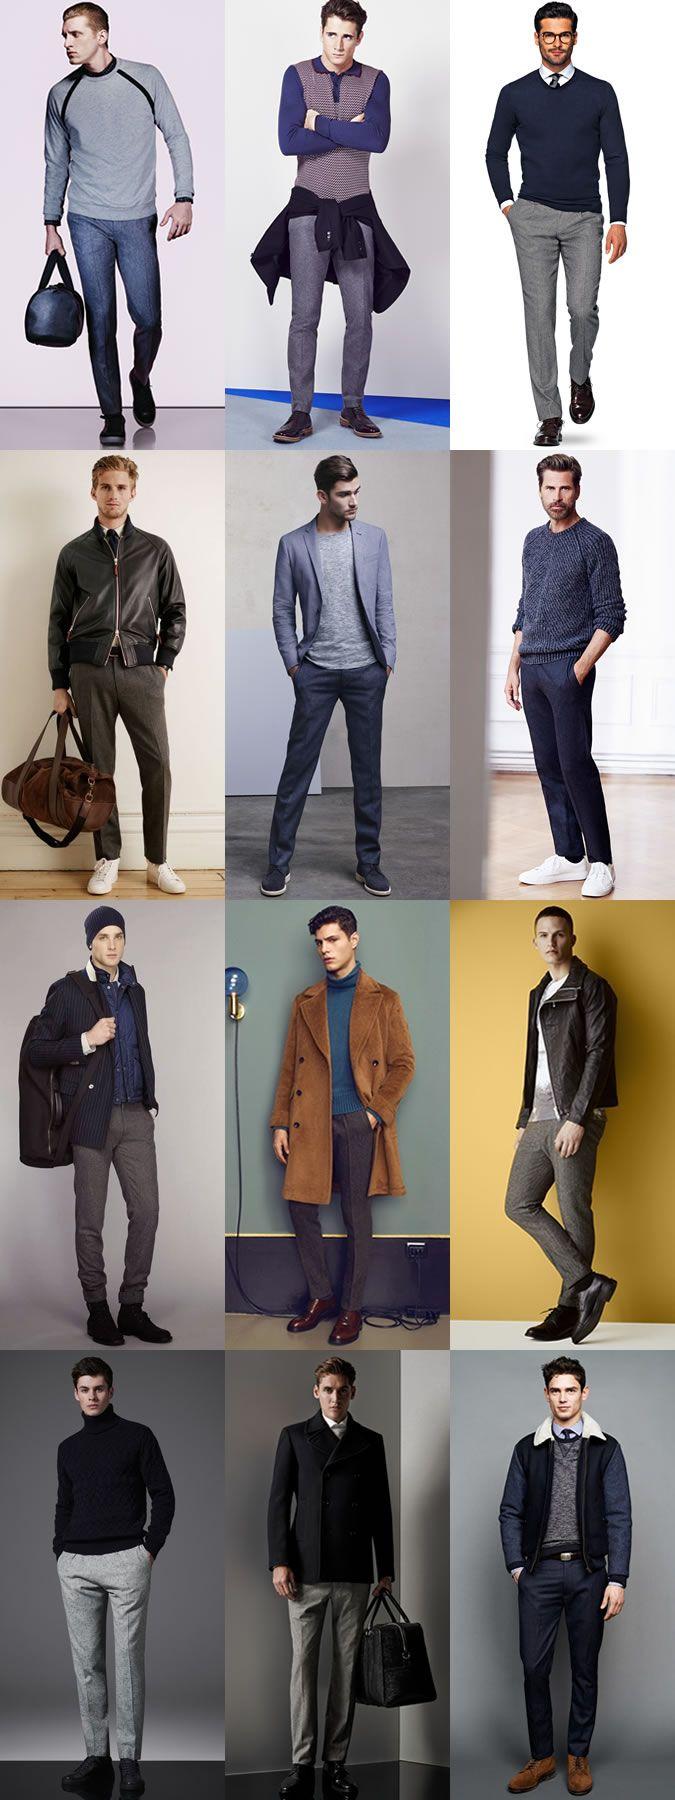 Men's Autumn Wardrobe Essentials: Wool Trousers Autumn Outfit Inspiration Lookbook